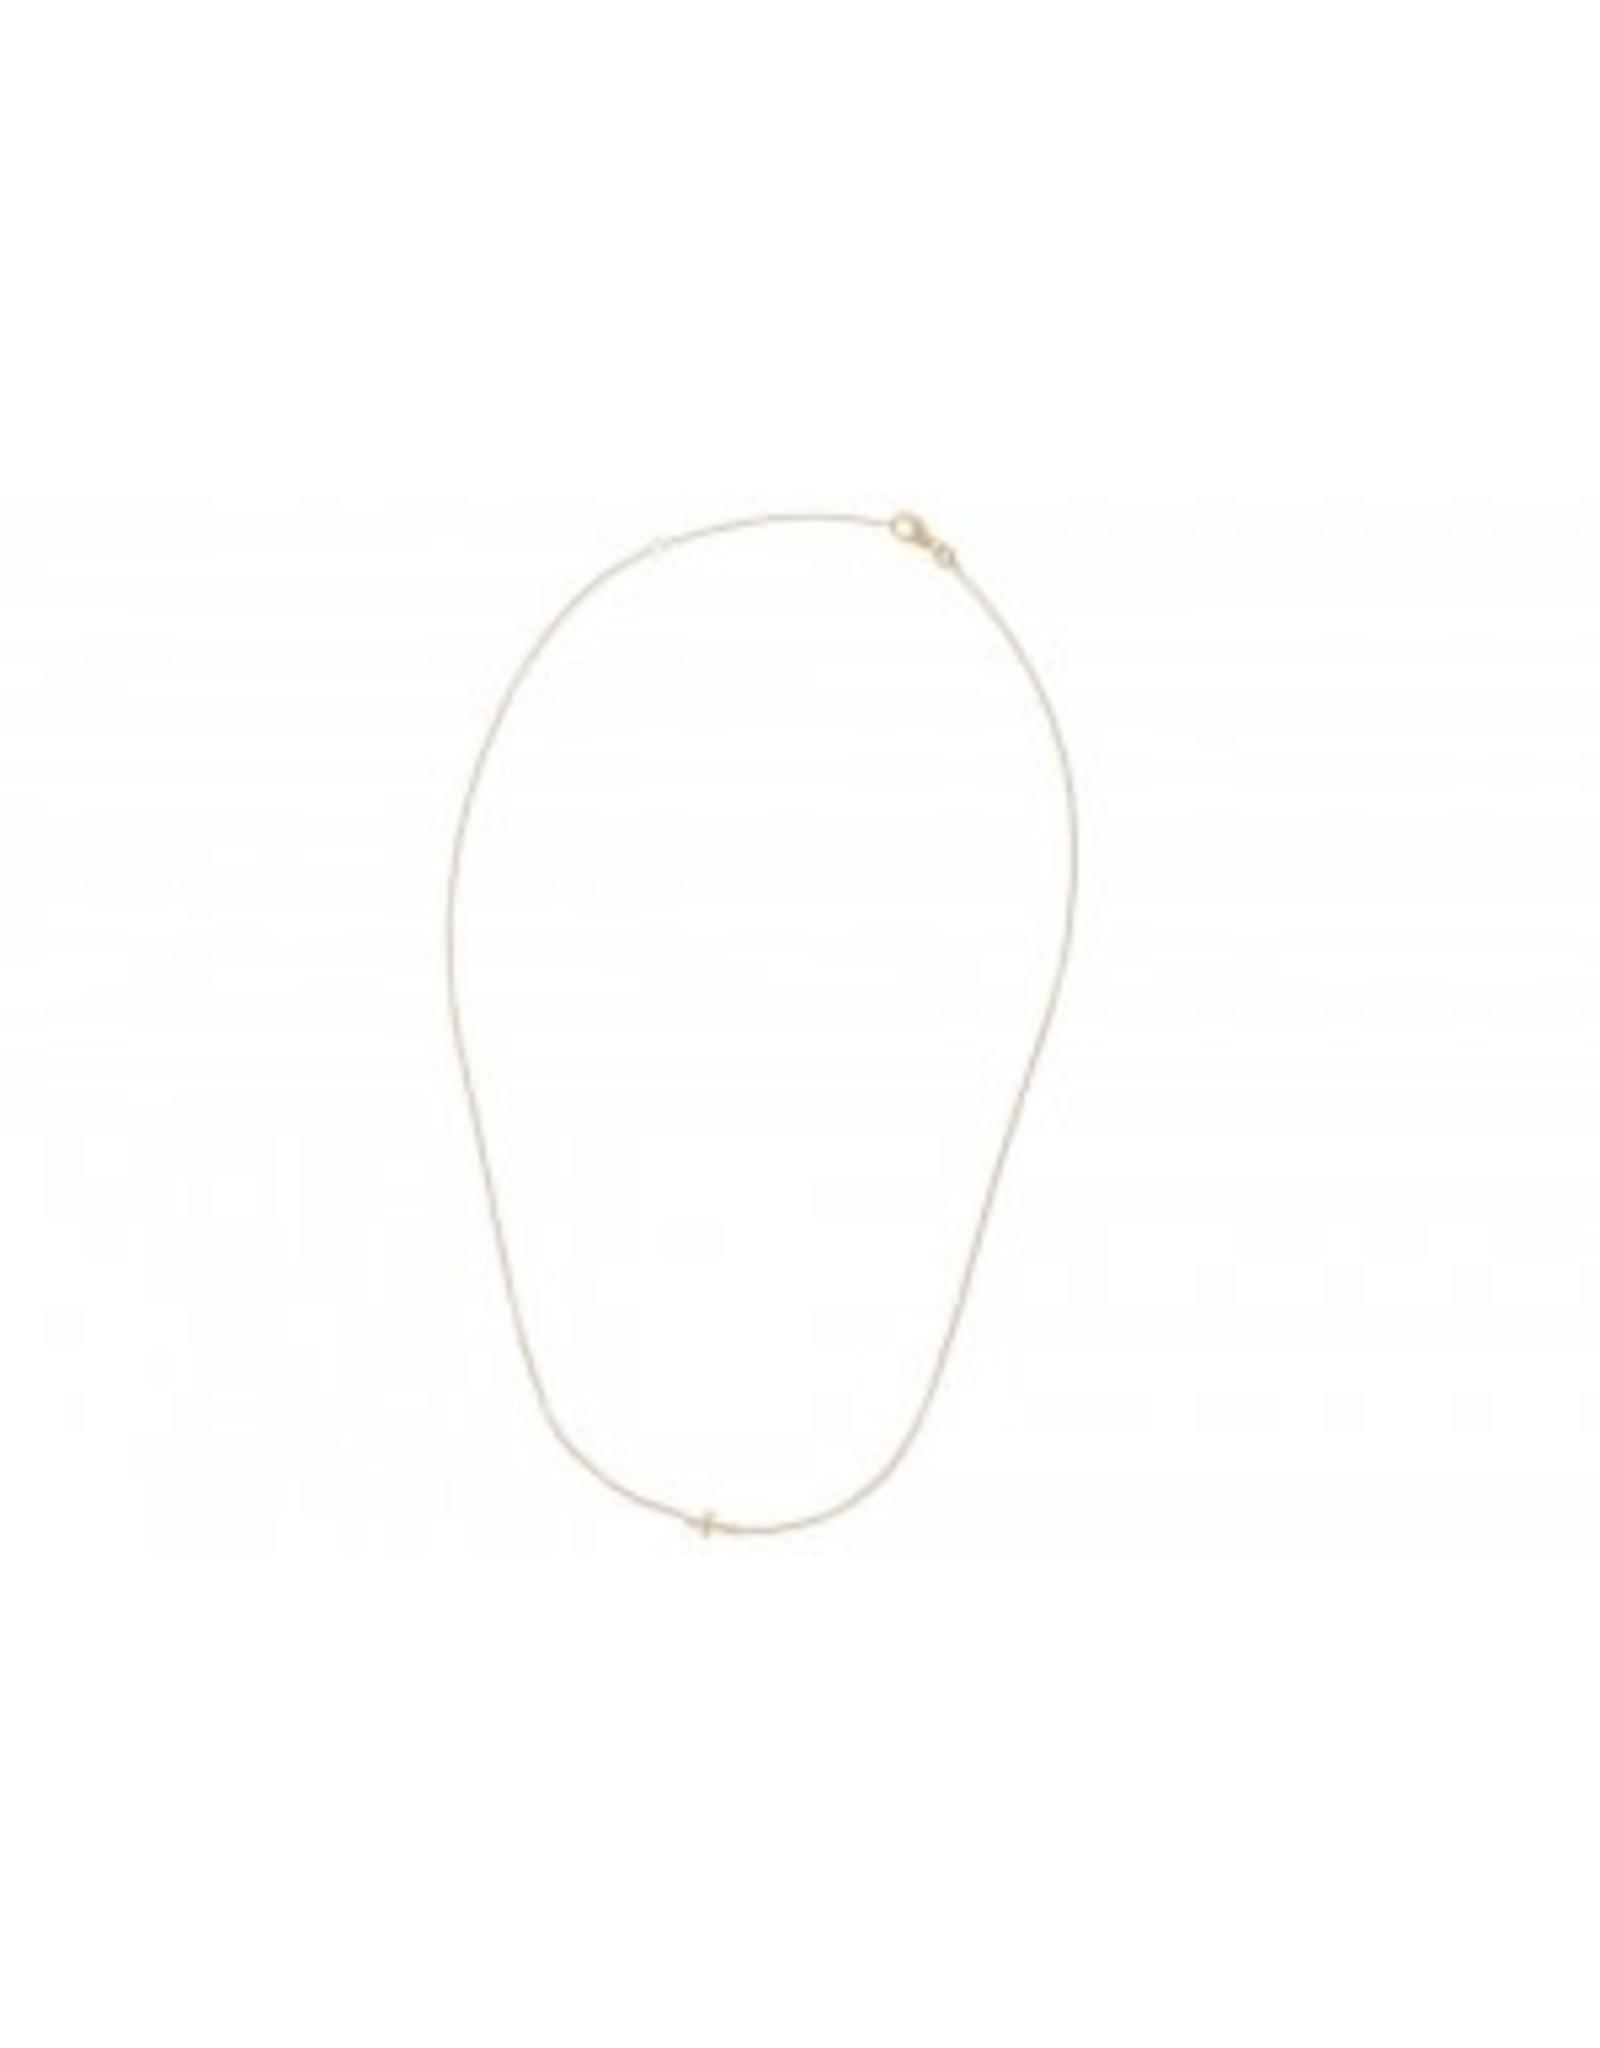 Miss Spring Halsketting Tiny Ones Geel Goud 18kt MSC156GG Kruisje